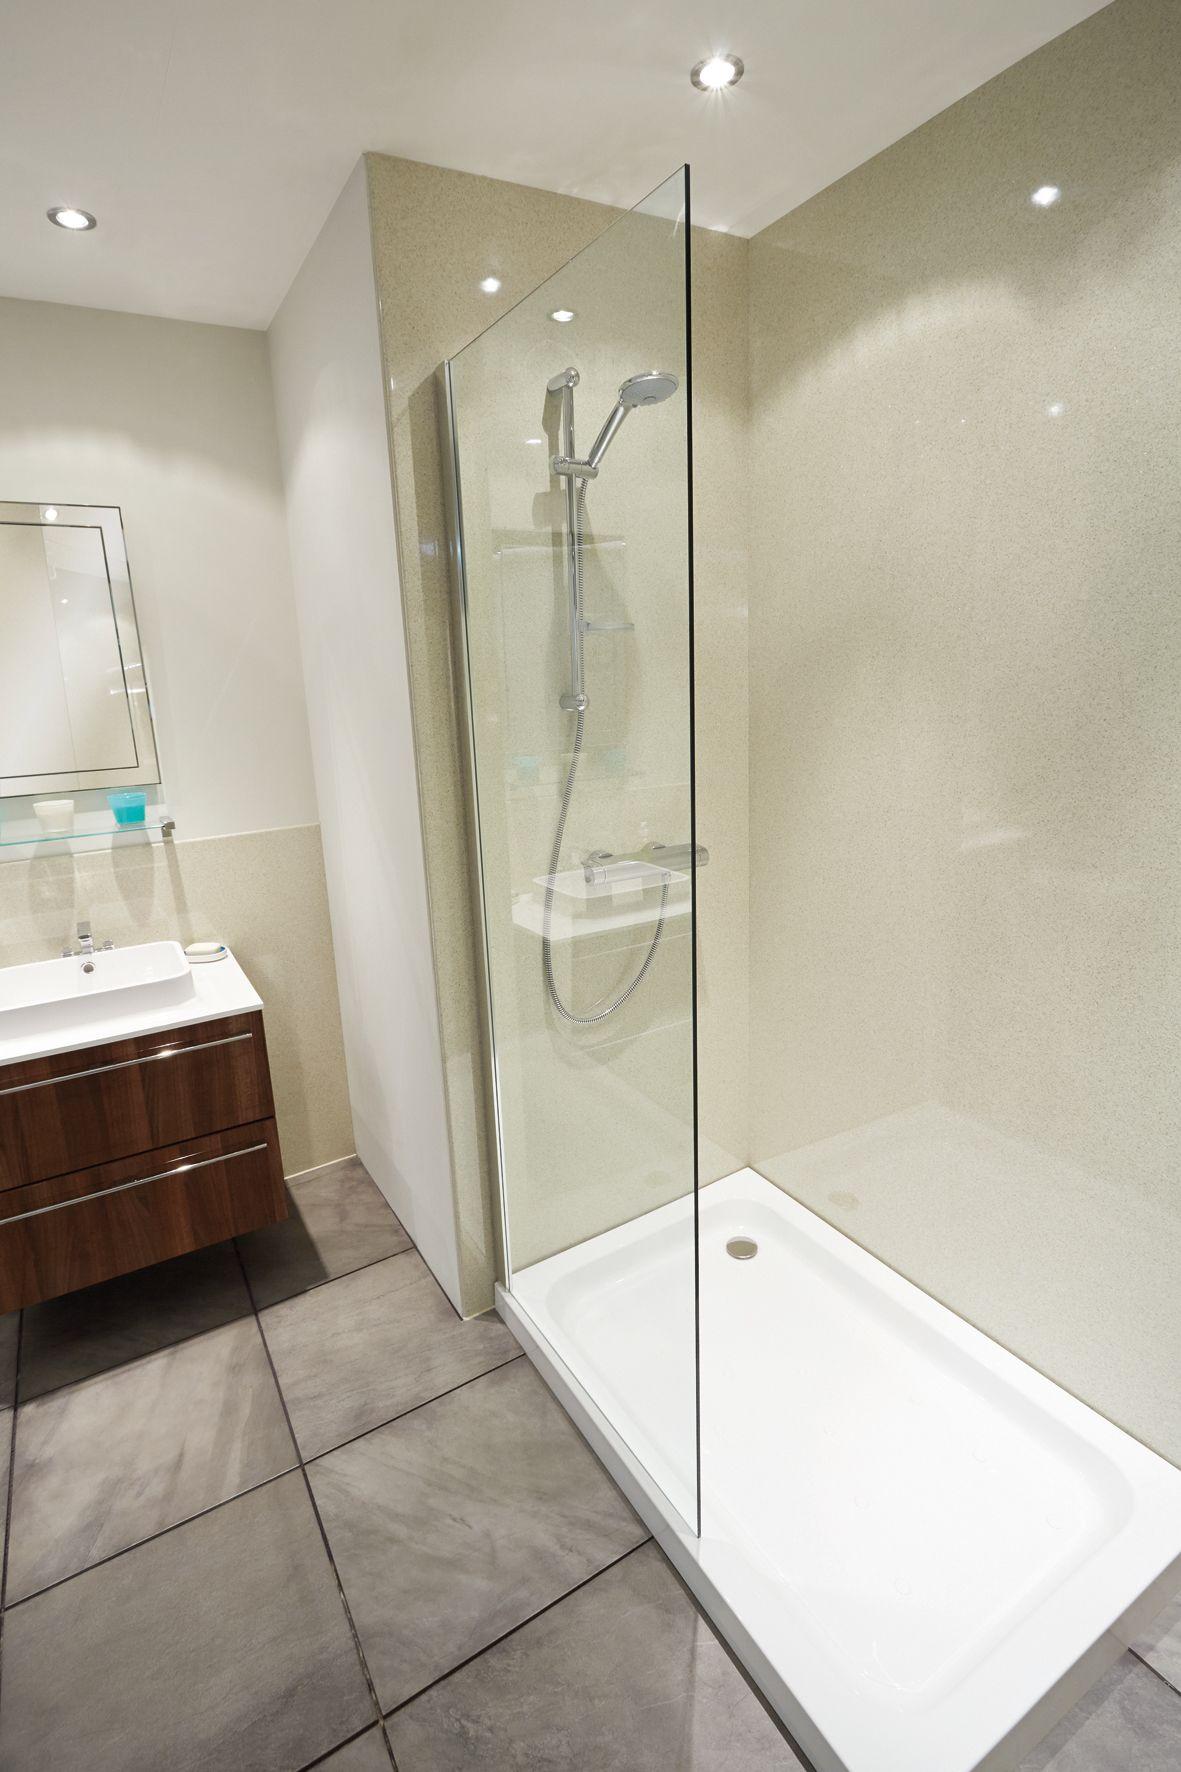 Ремонт туалета панелями однотонными